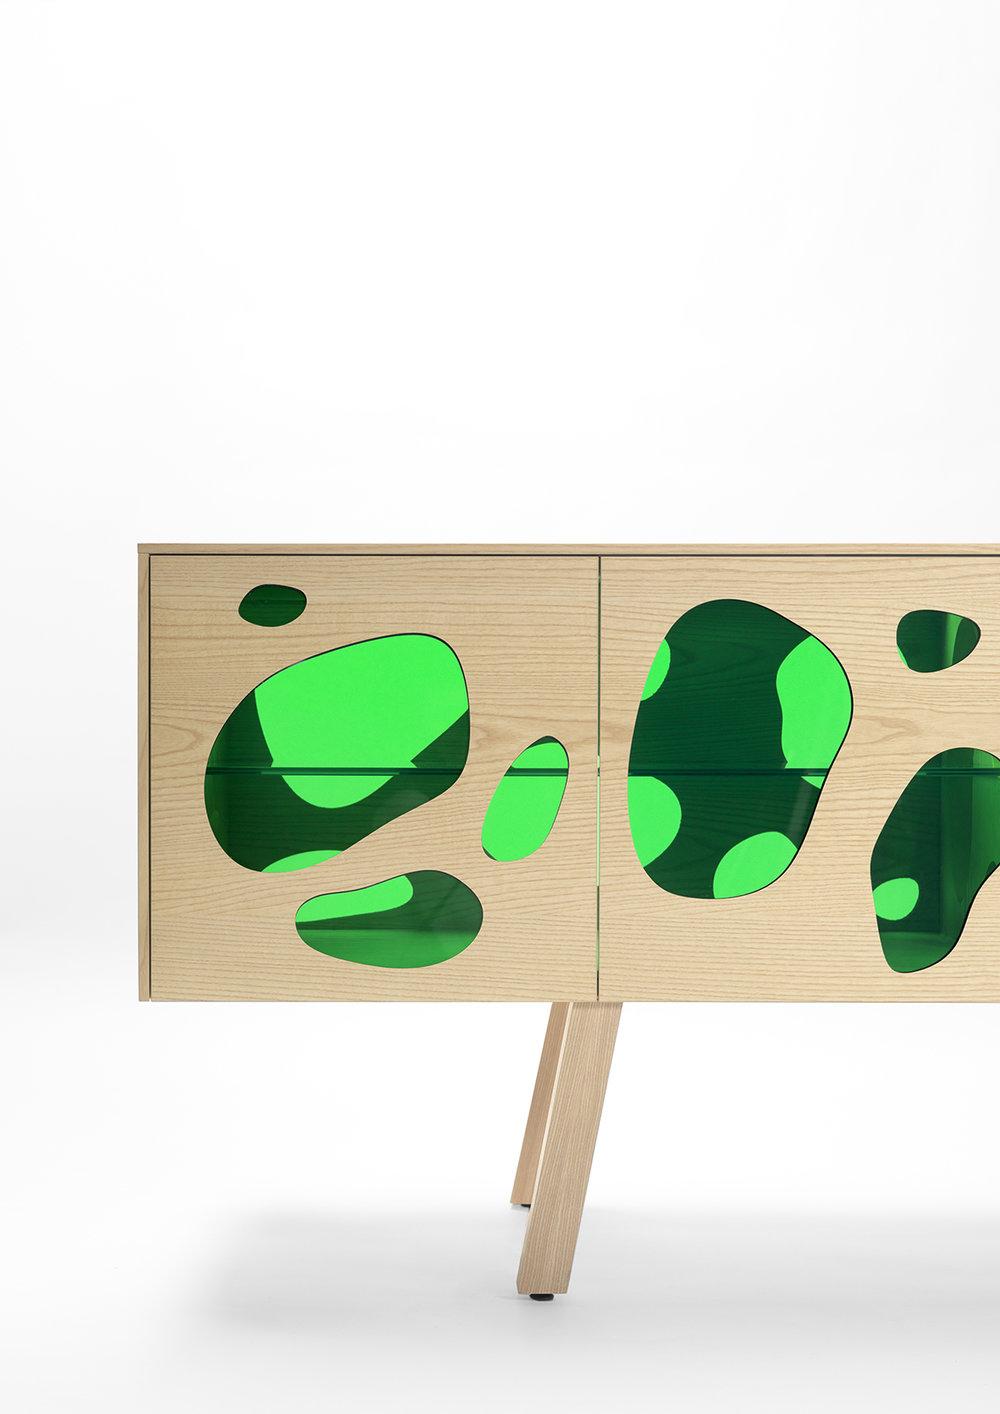 Aquario Cabinet, Campana Brothers, 2016.